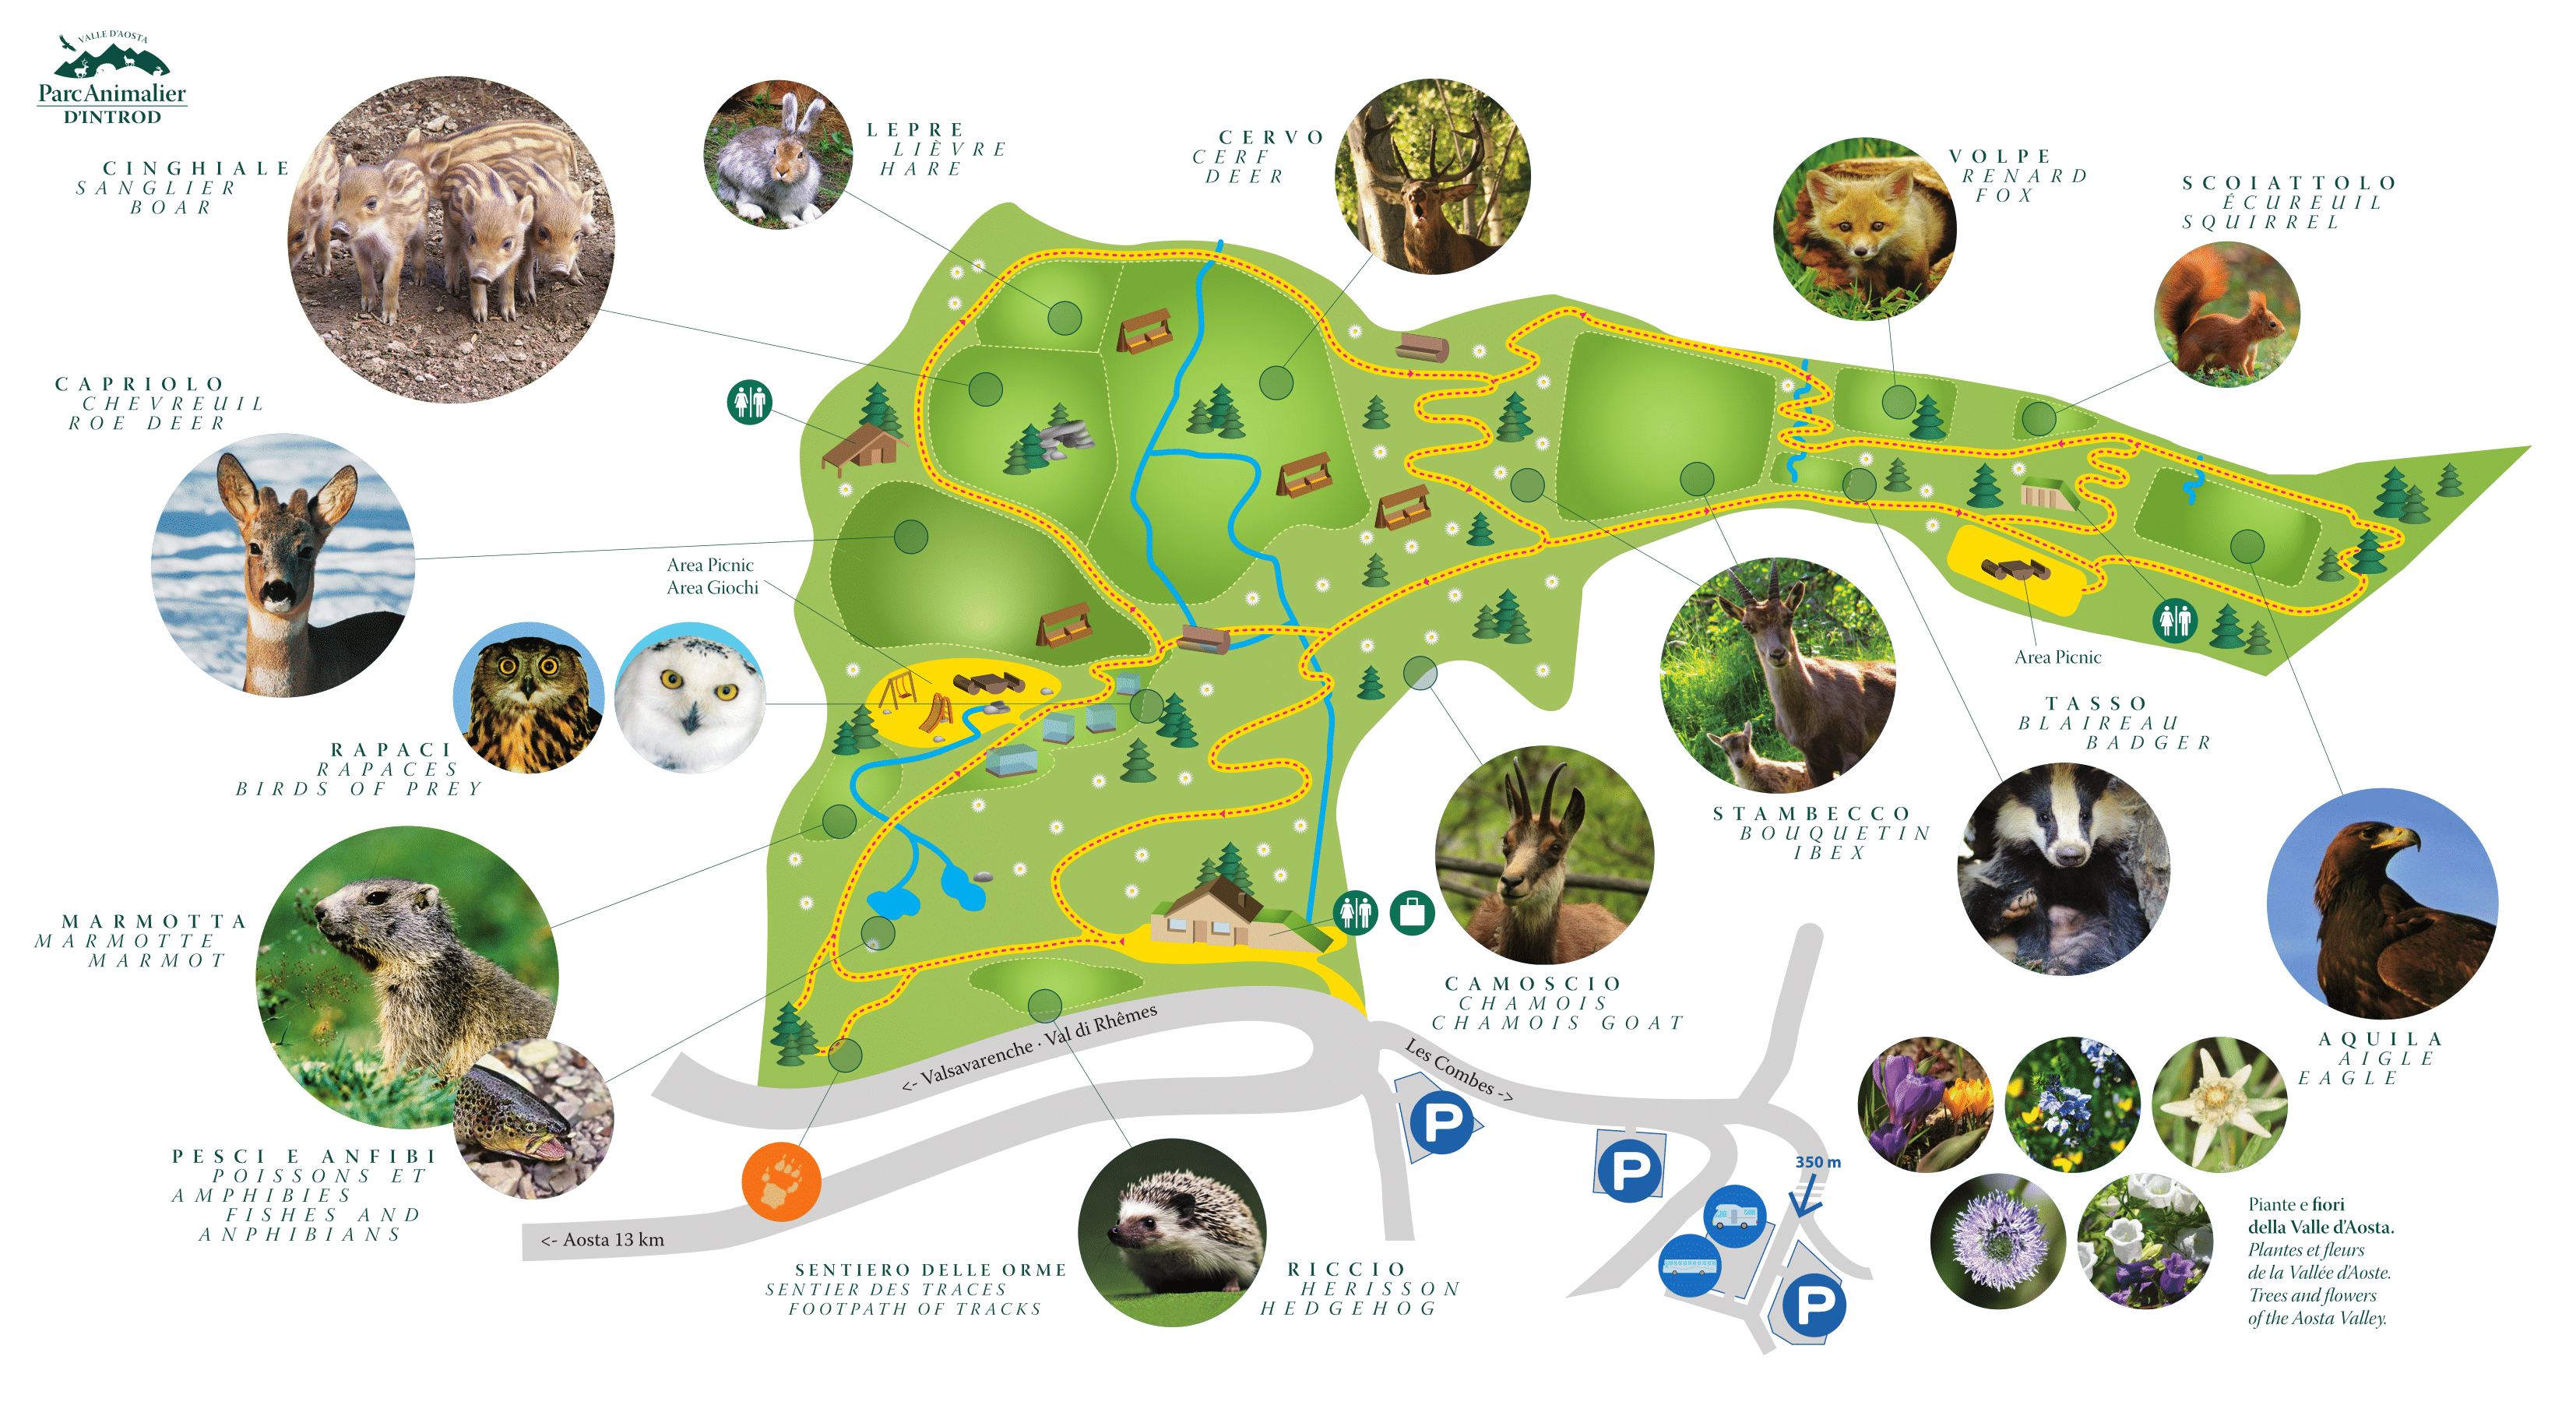 Mappa Parc Animalier d'Introd